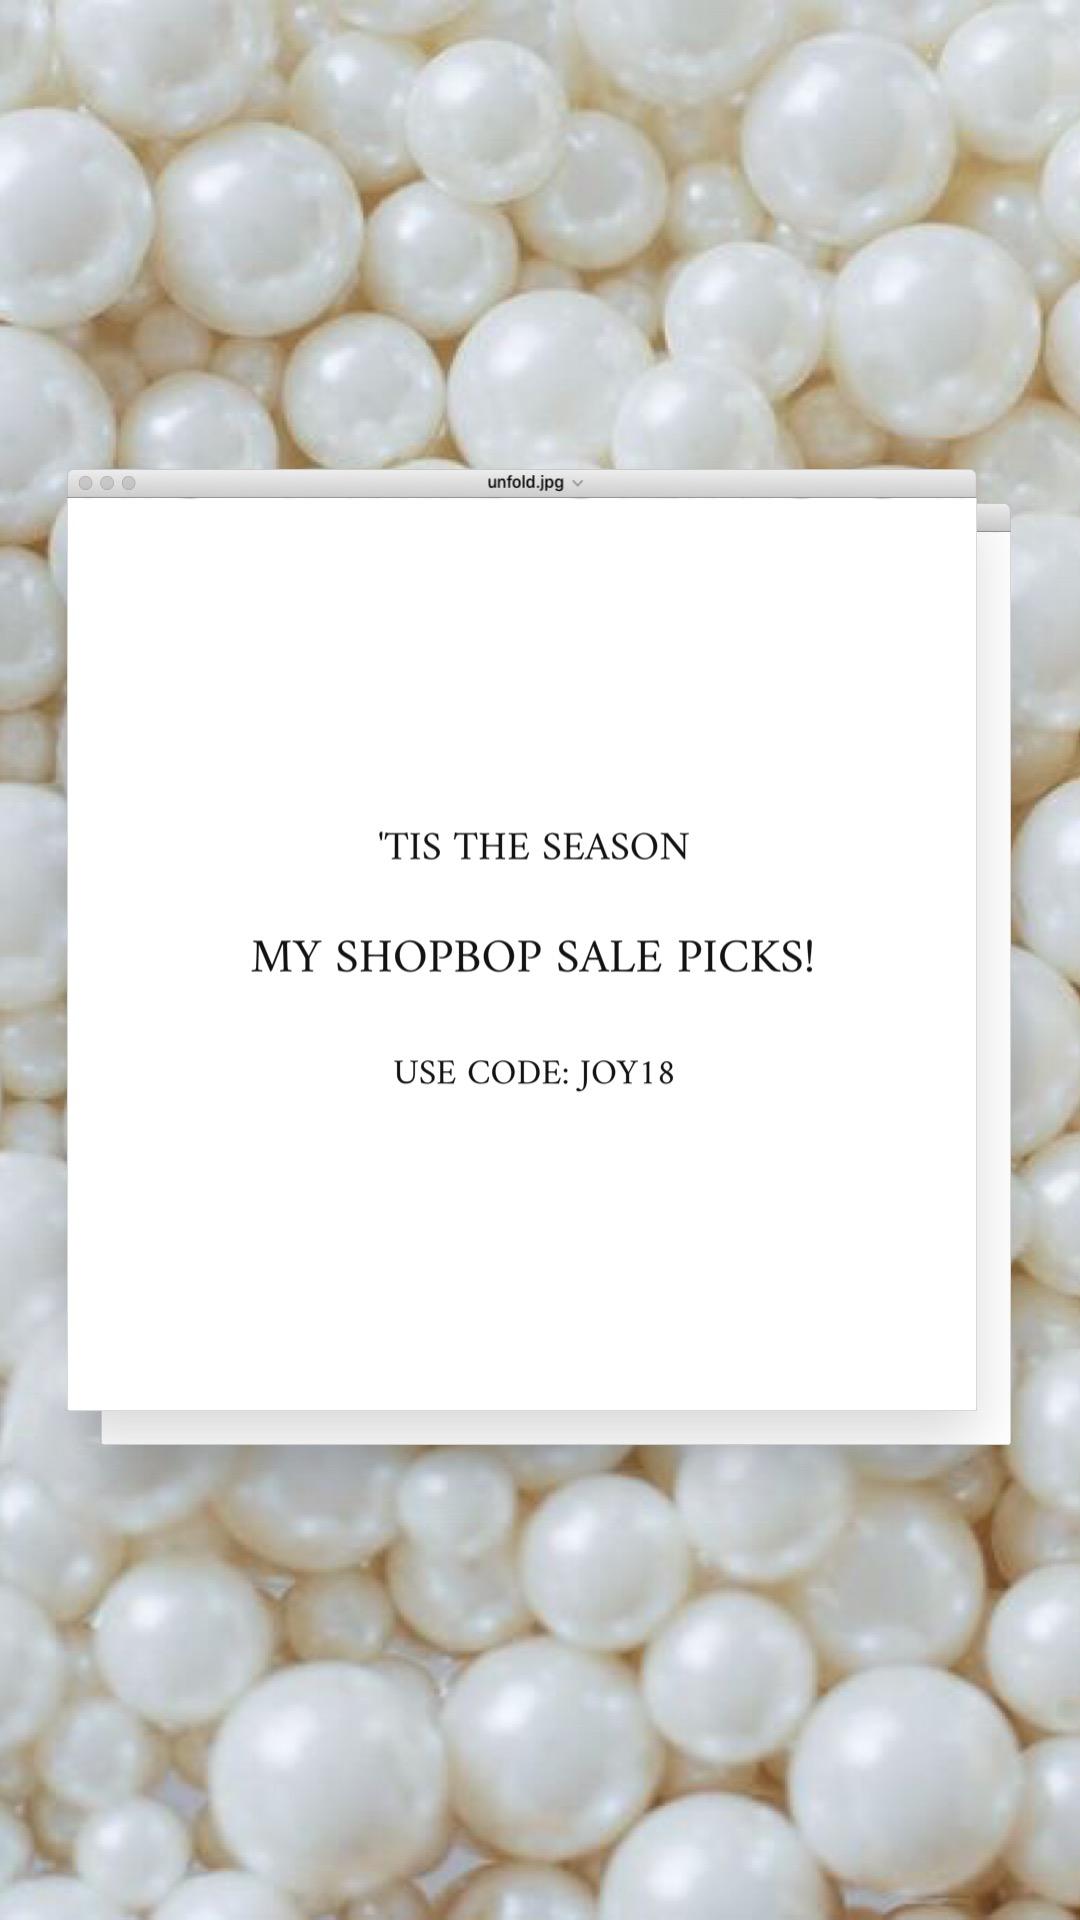 SHOPBOP sALE - 21 of my favorite SHOPBOP sale picks!